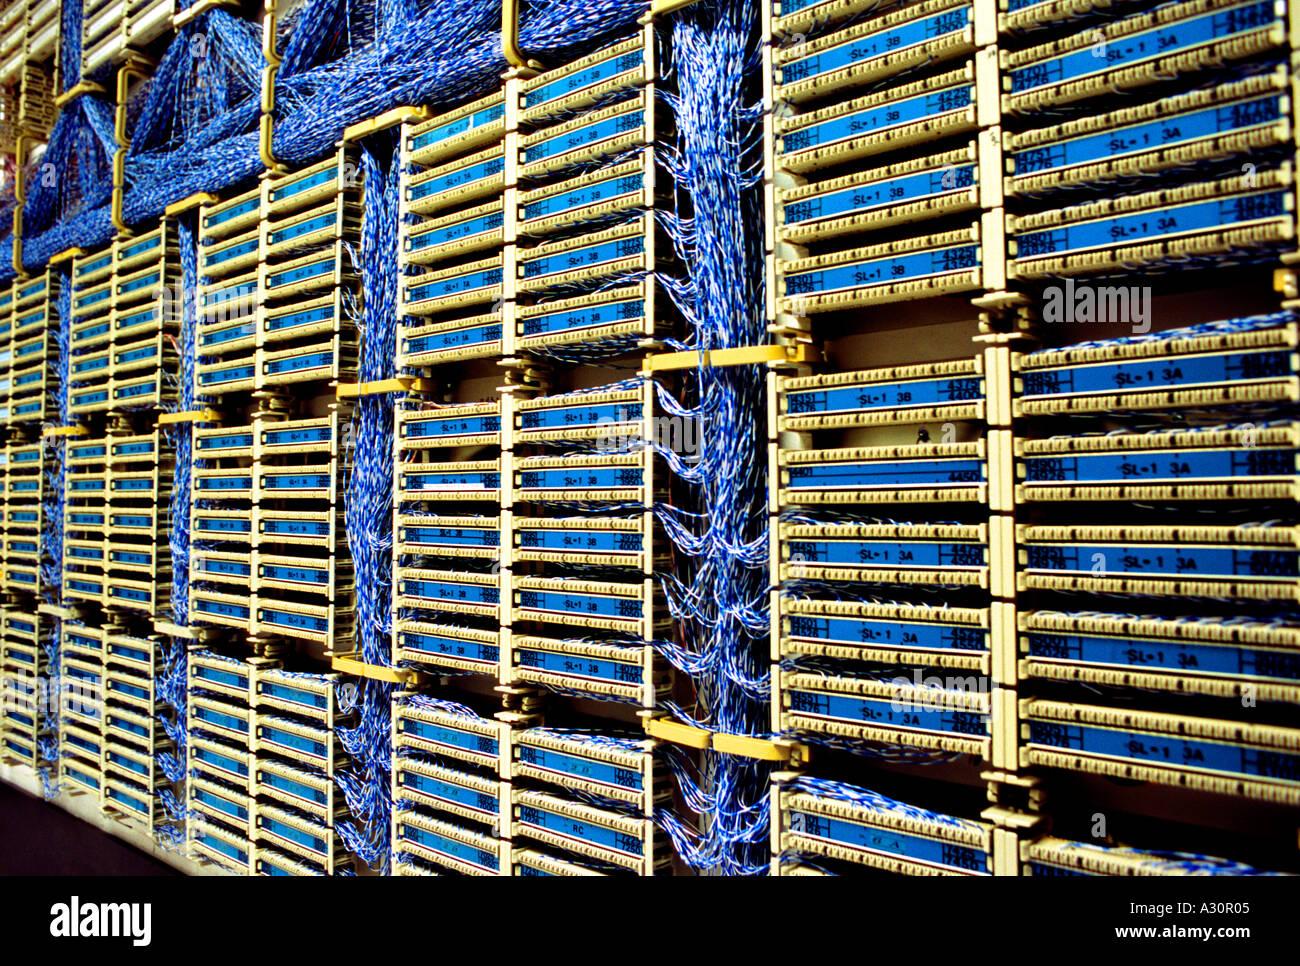 Hauptverteiler Stockfoto, Bild: 3471108 - Alamy